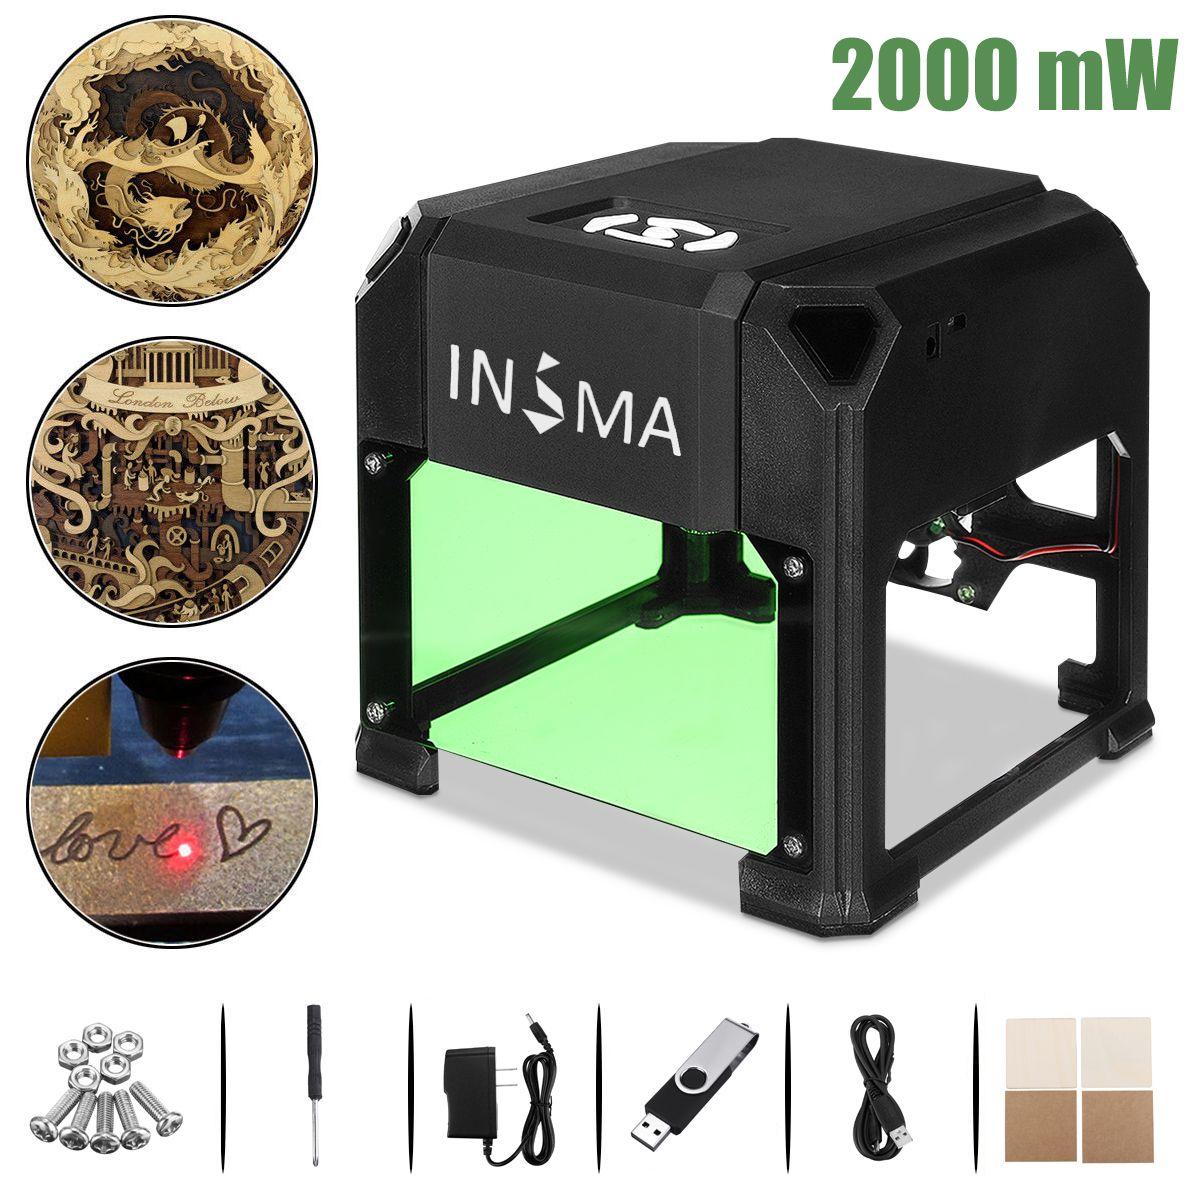 2000/3000 mW CNC Laser Engraver DIY Logo Mark Printer Cutter Laser Engraving Carving Machine For Windows XP/7/8/10 for MAC OS